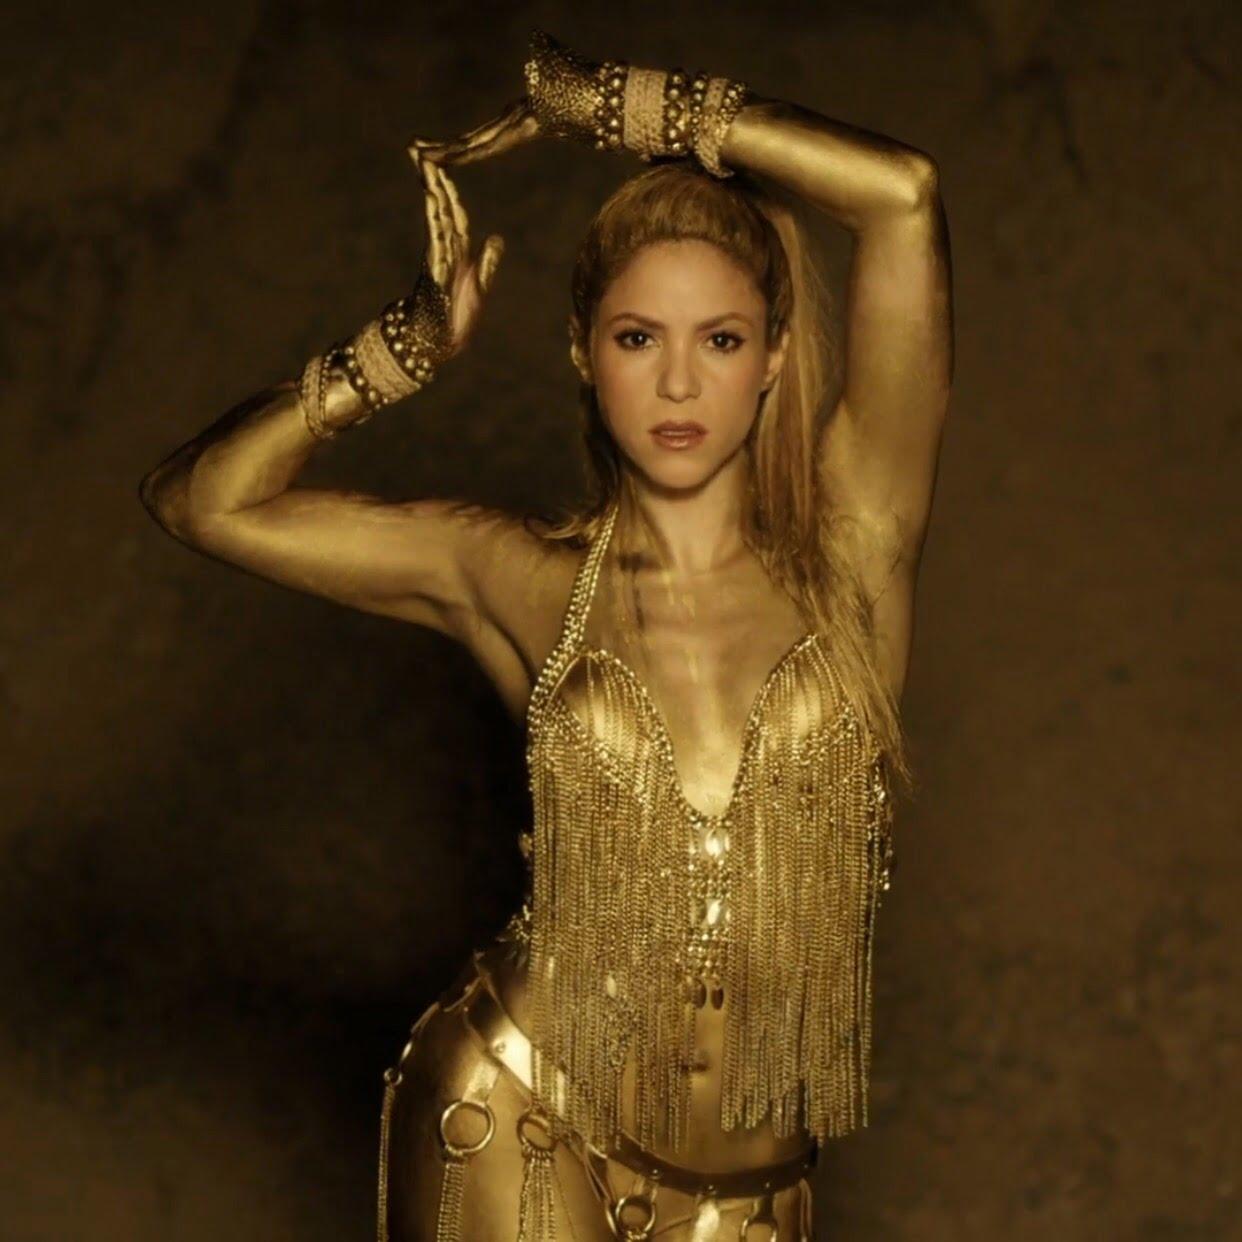 All on the edge entertainment fashion lifestyle art design music - Shakira Nicky Jam Design